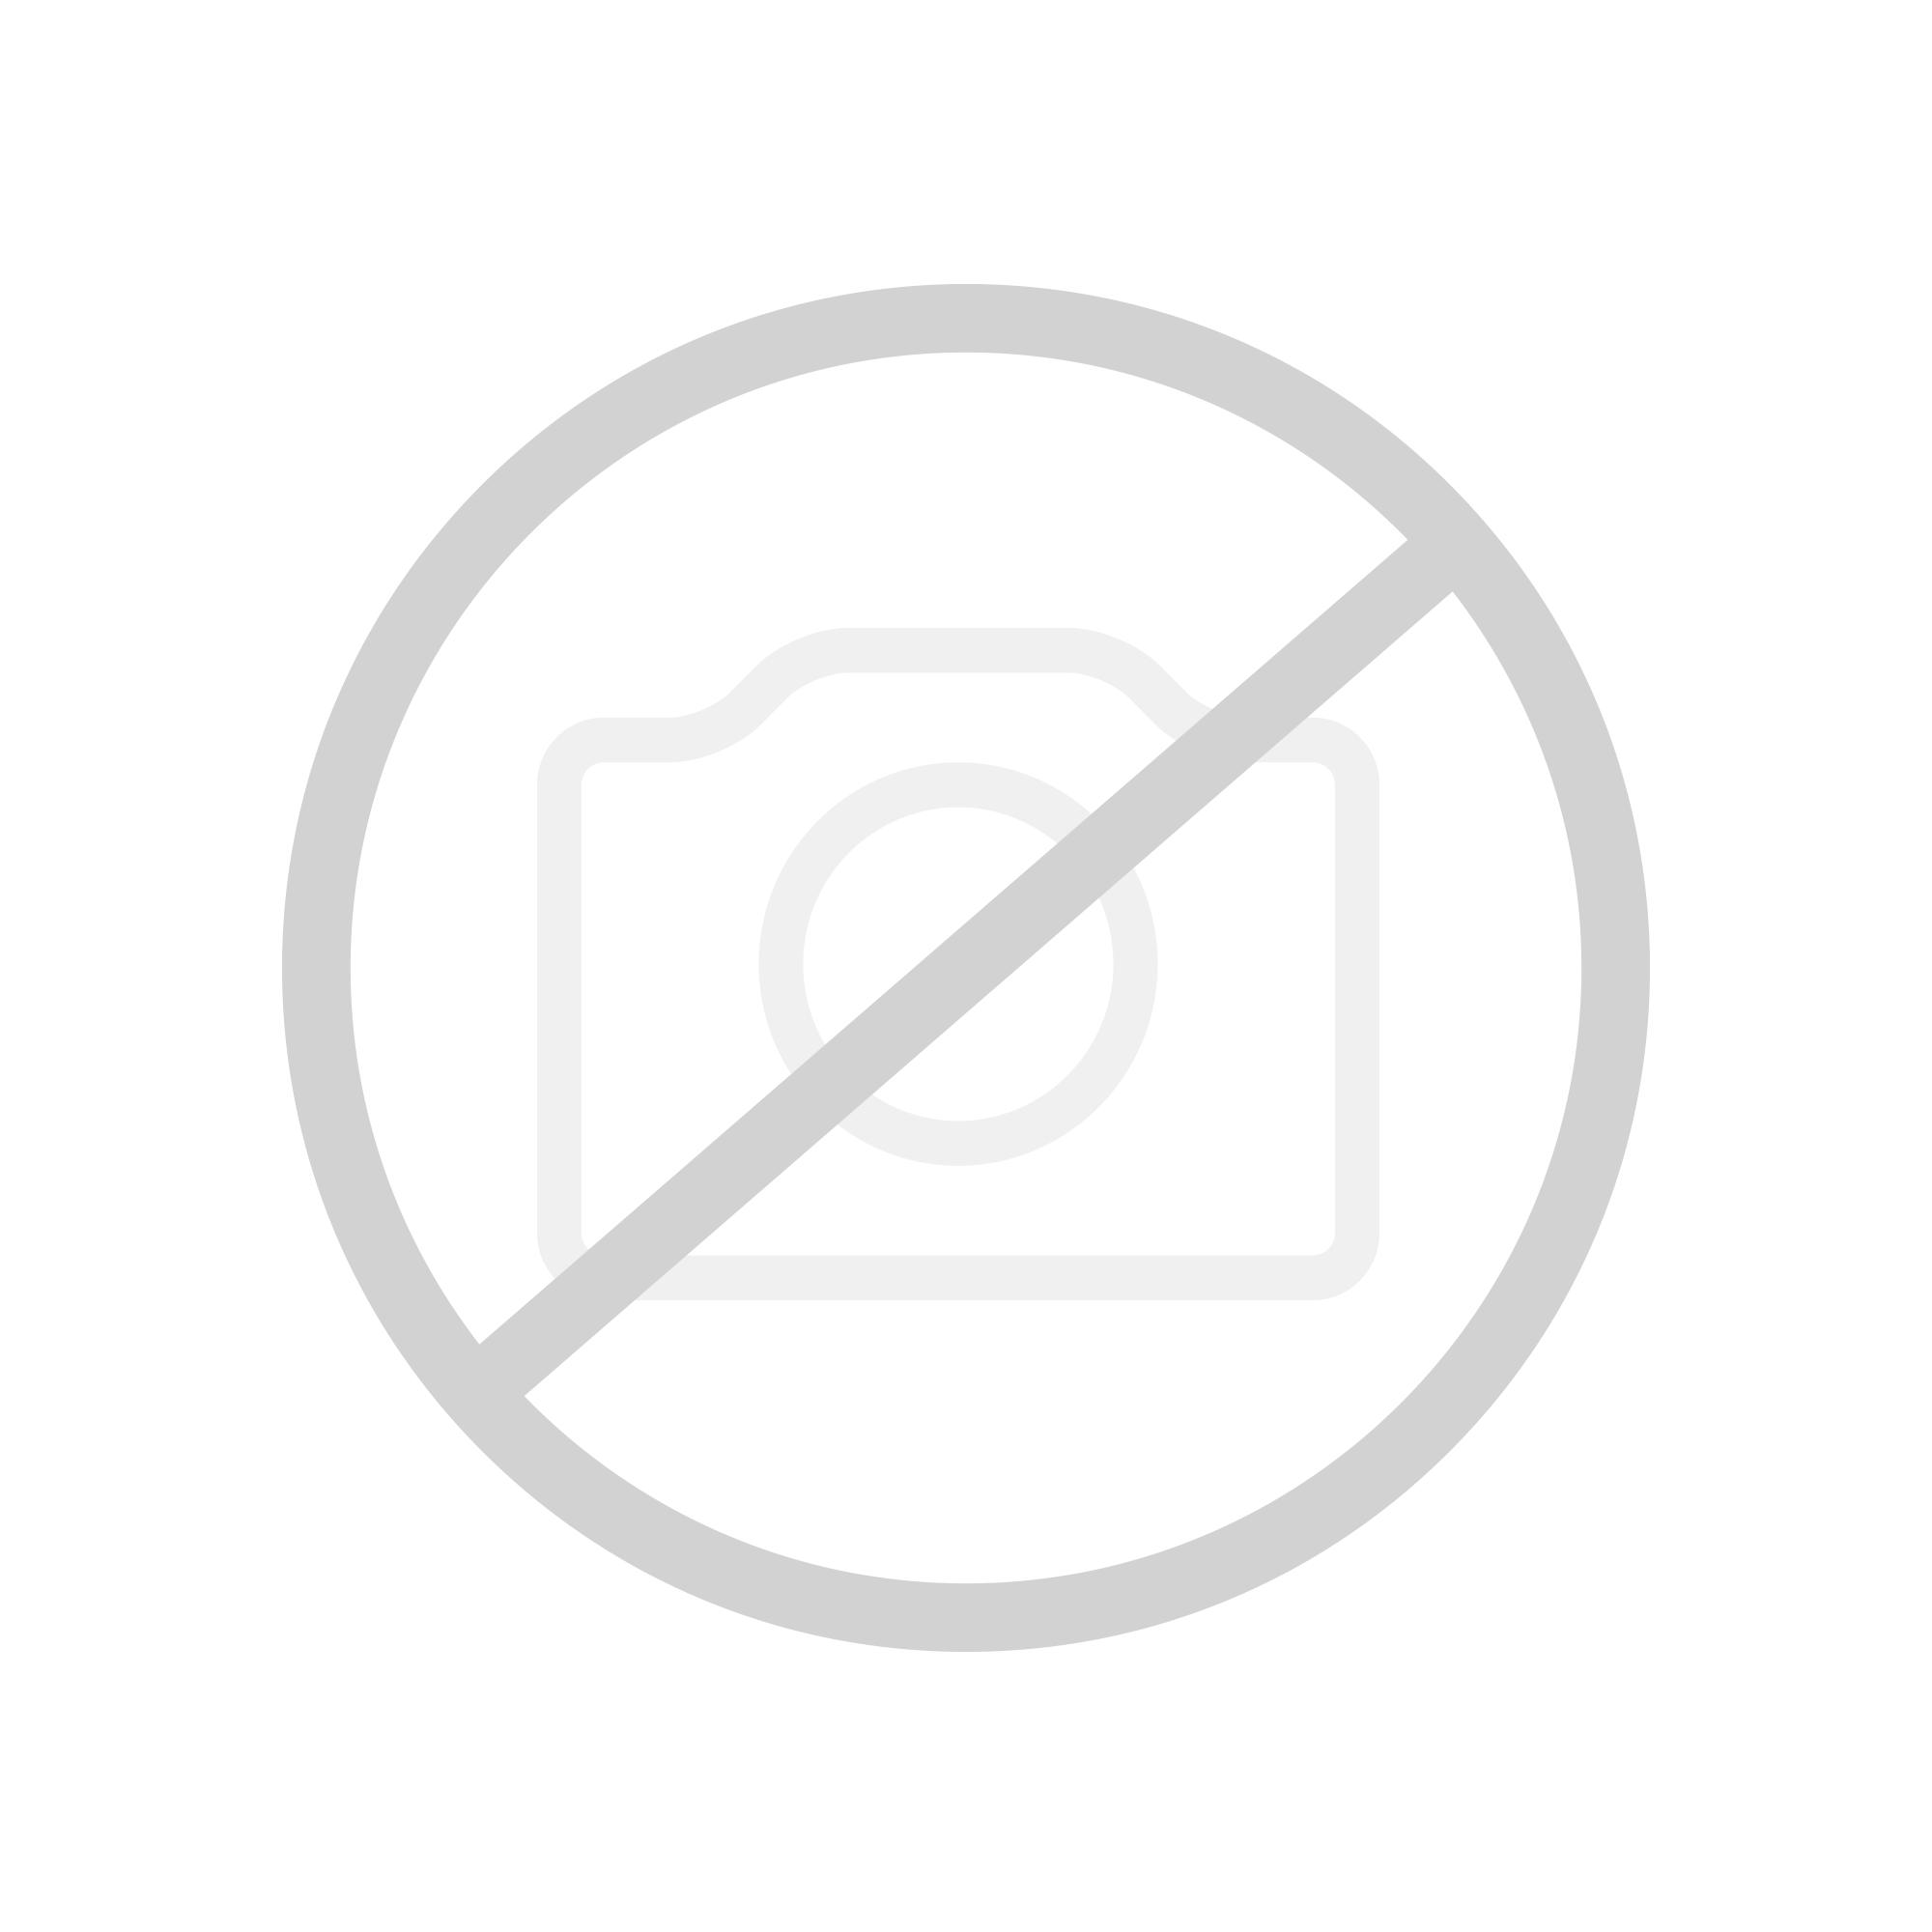 hansgrohe axor urquiola thermostat unterputz mit ab. Black Bedroom Furniture Sets. Home Design Ideas